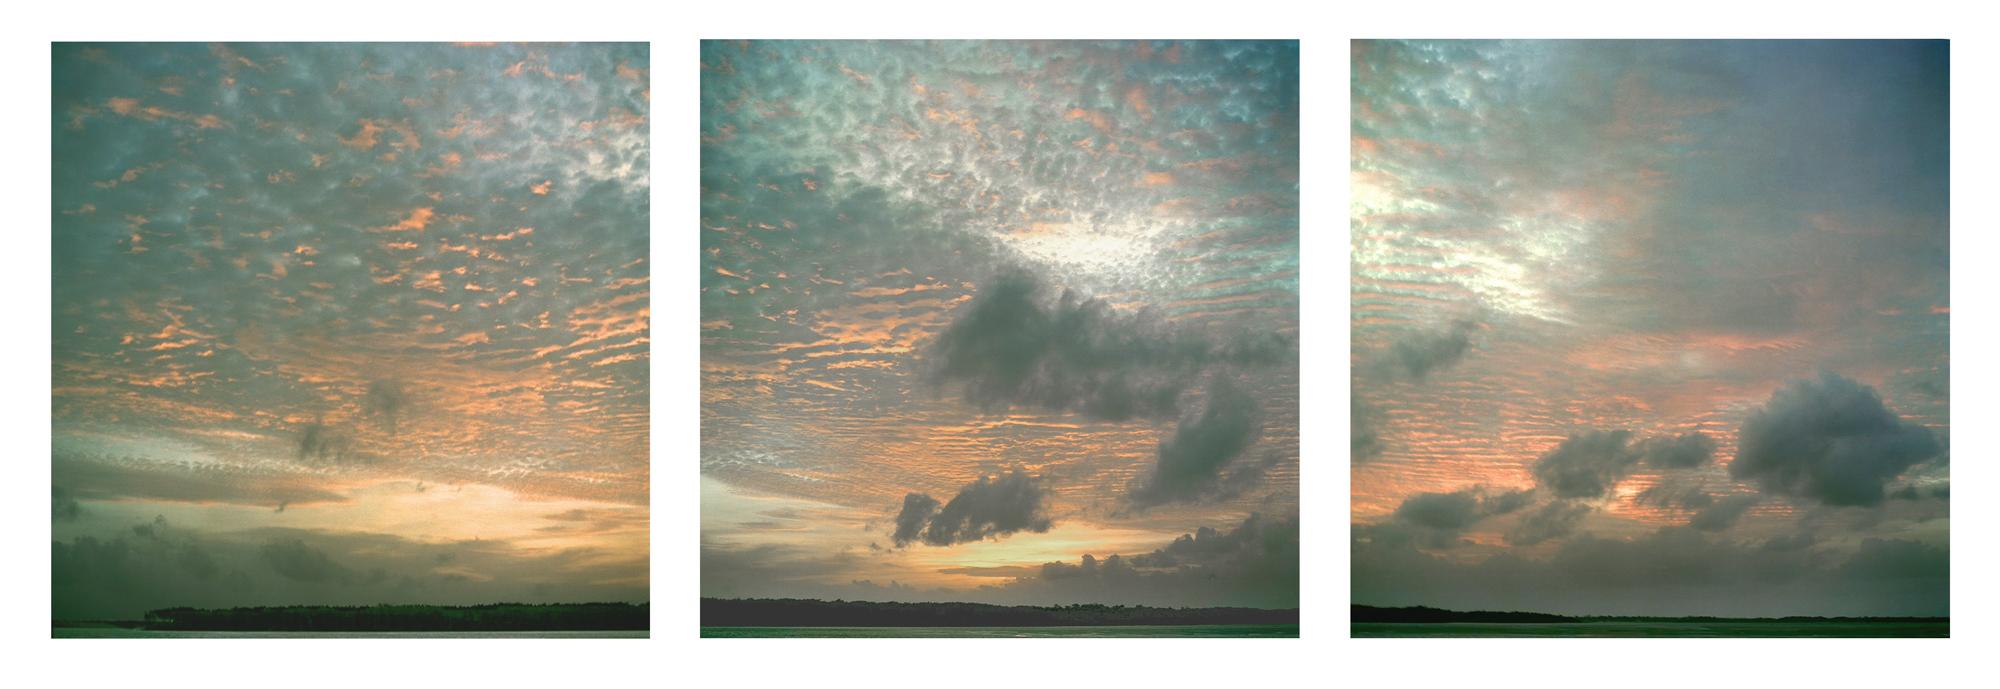 "Altins Sunrise , Brazil  3 images,30"" x 30"", 2007"